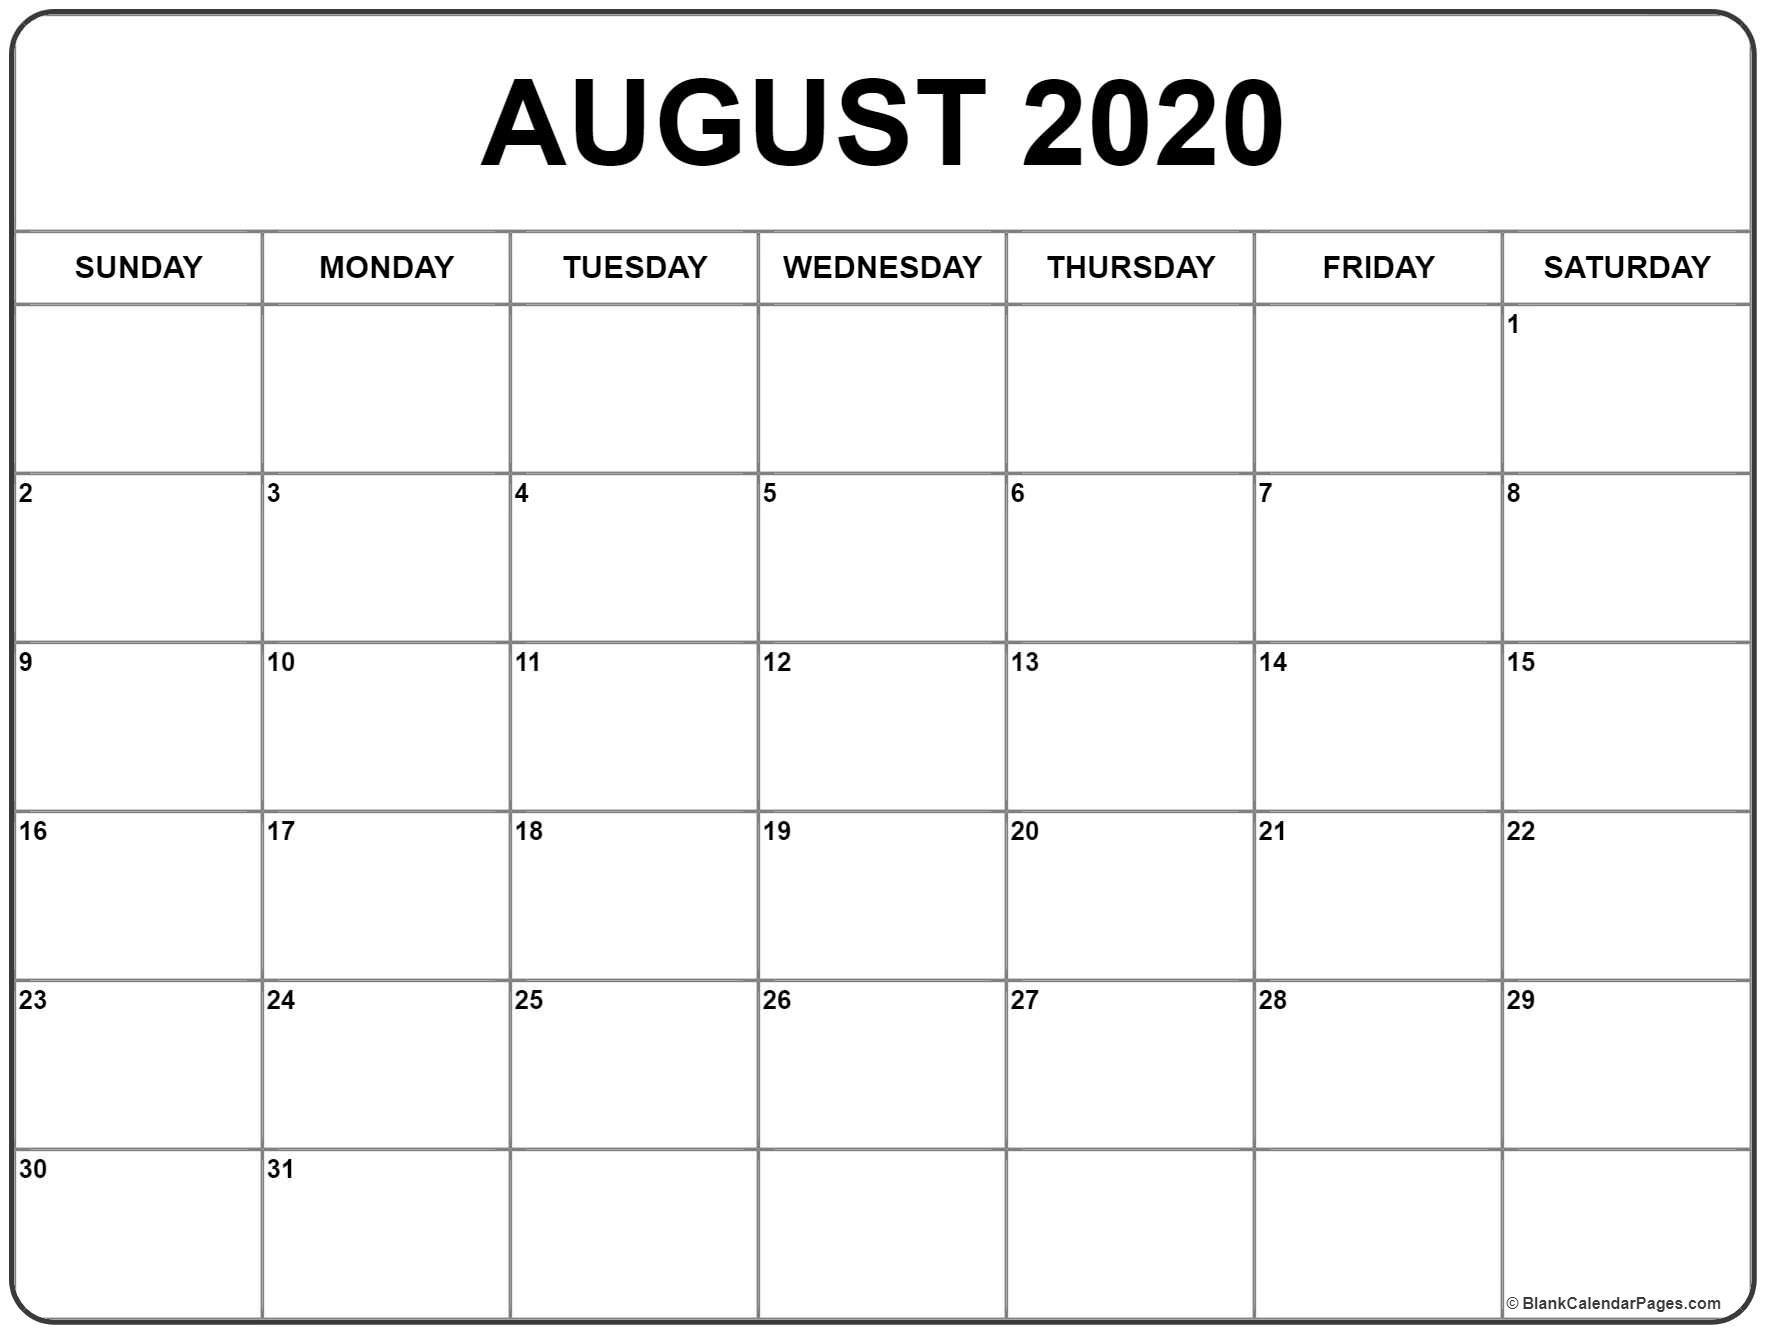 August 2020 Calendar . August 2020 Calendar Printableaugust pertaining to 8.5 X 11 Free Printable Calendars